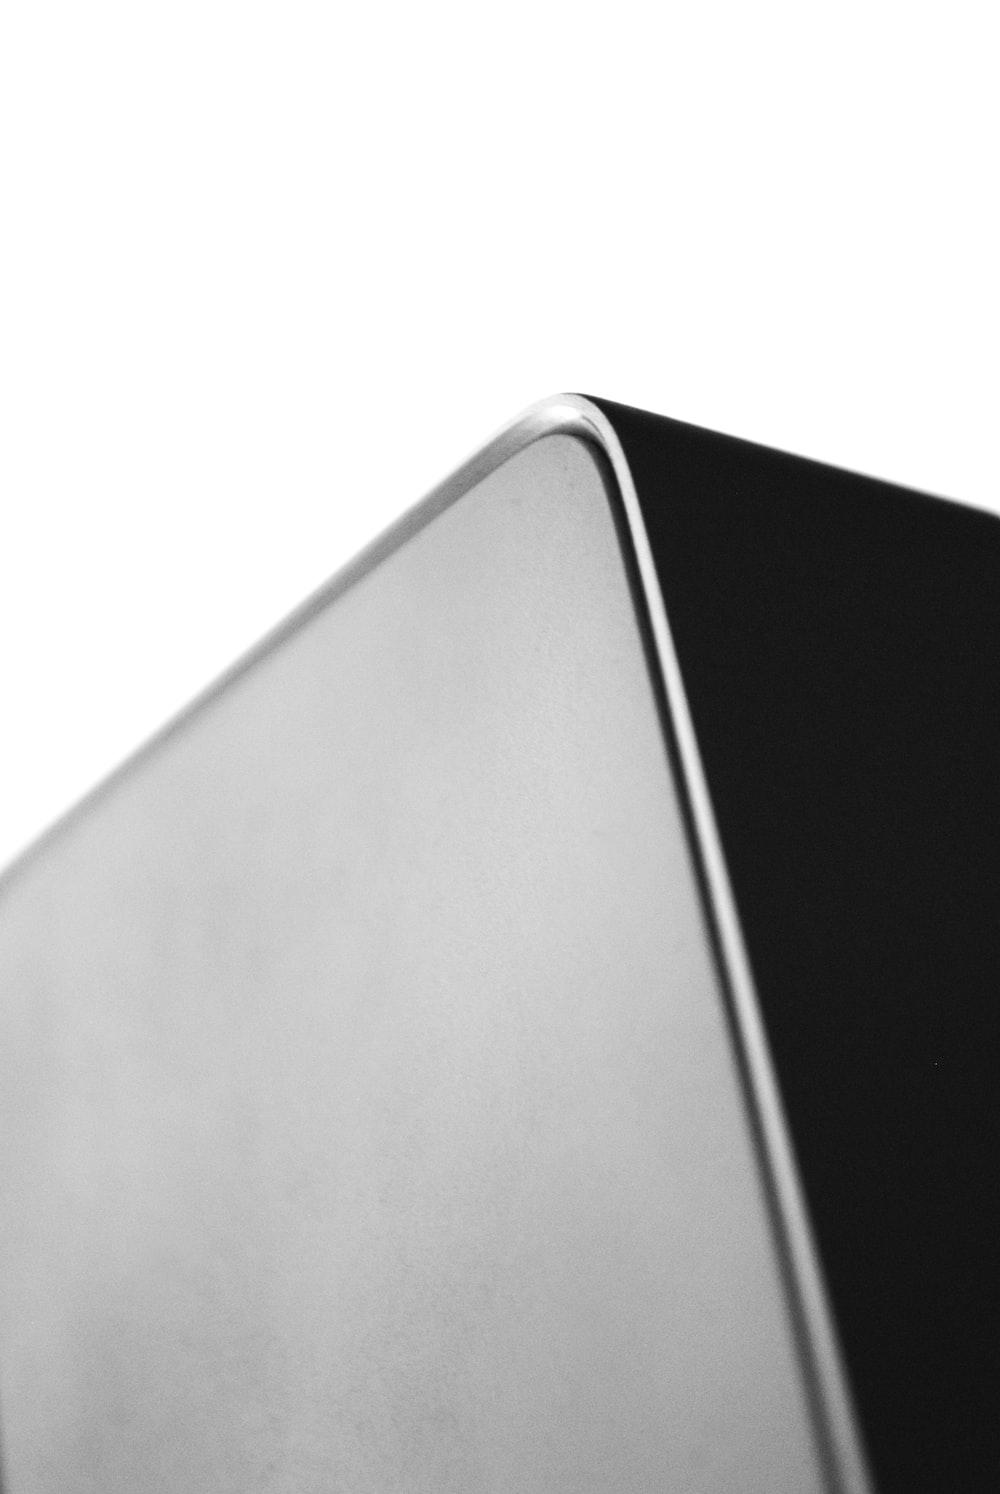 black and white device illustration